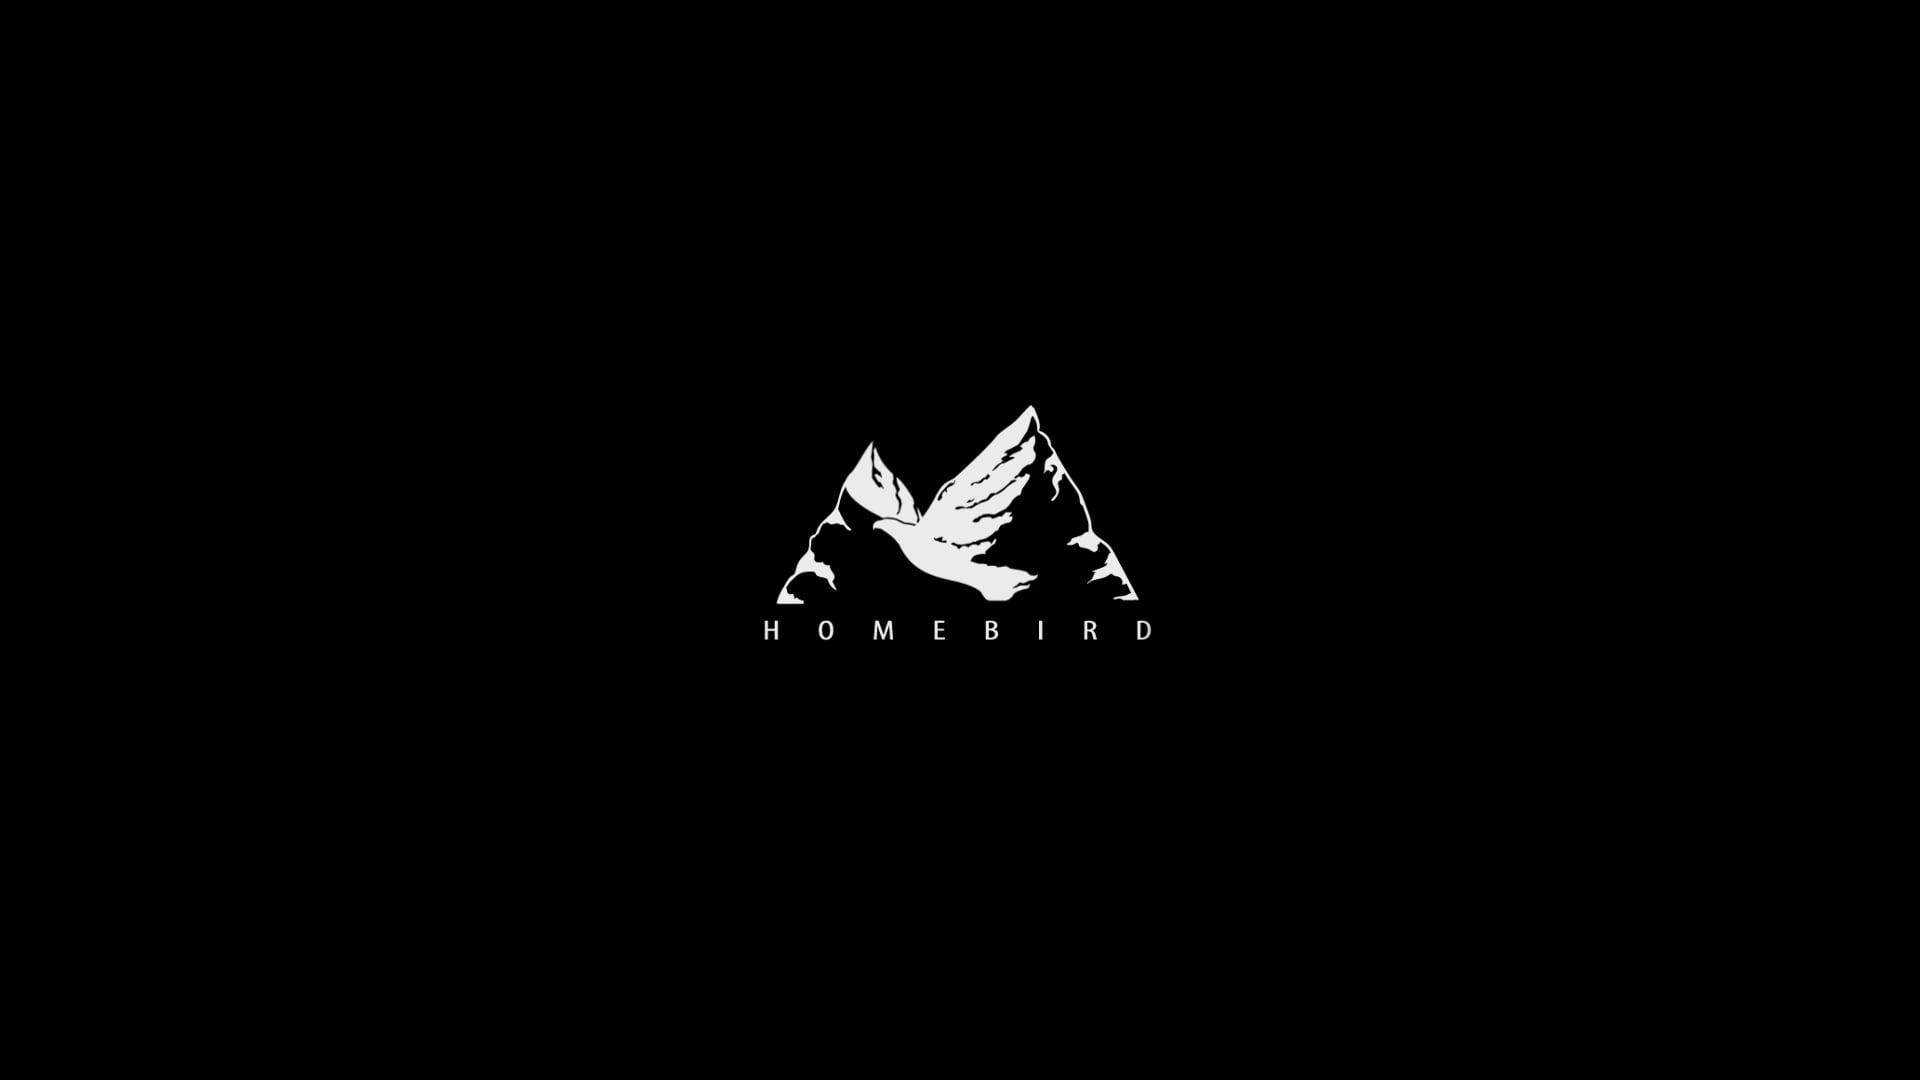 Homebird - Nepal Documentary (EN subs)